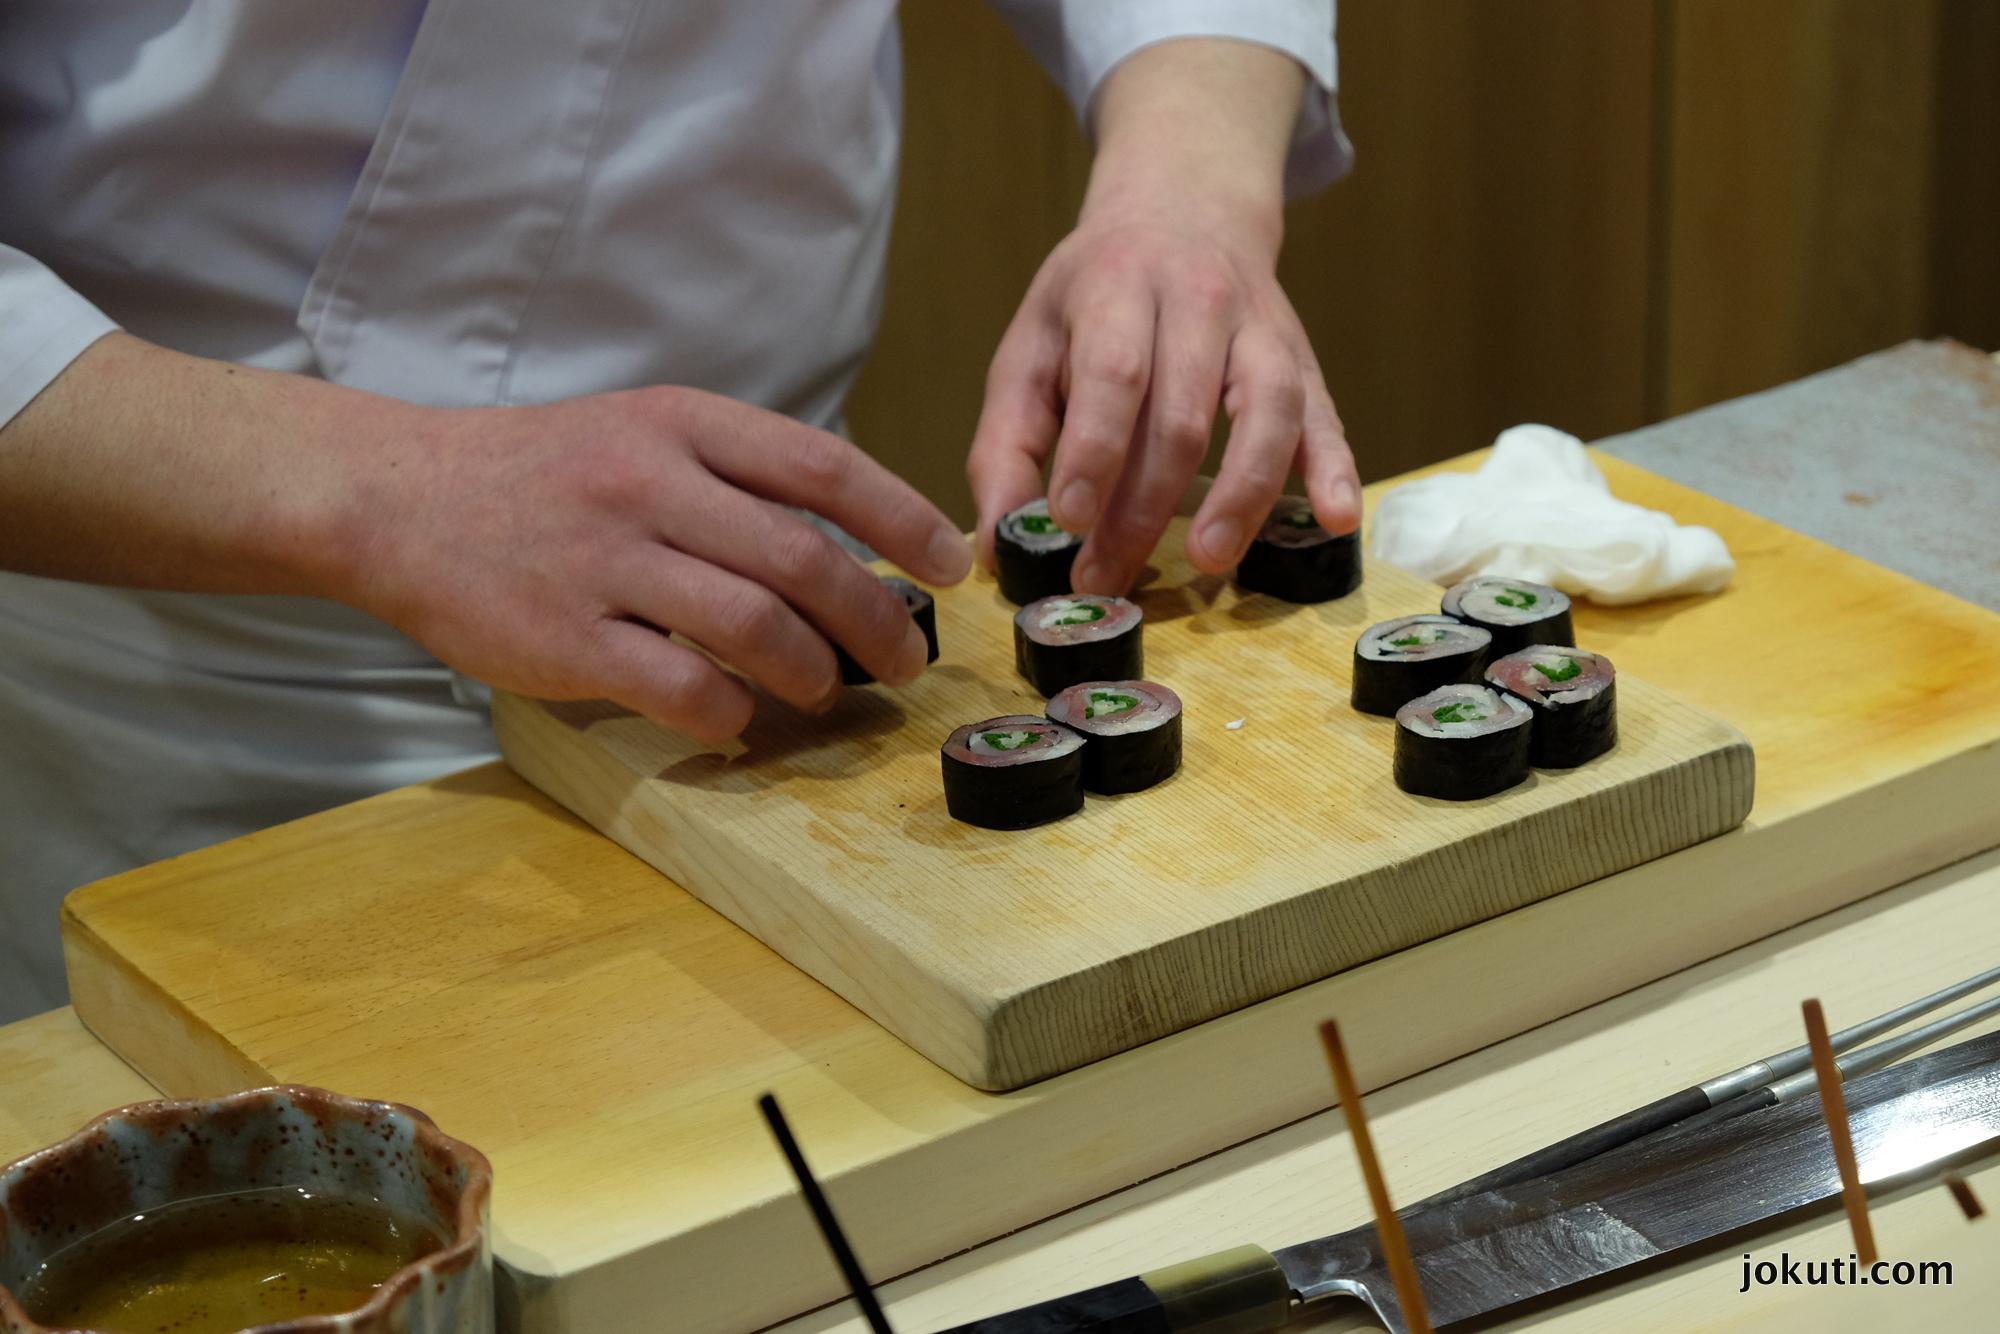 dscf5491_sugita_sushi_michelin_tokyo_japan_vilagevo_jokuti.jpg